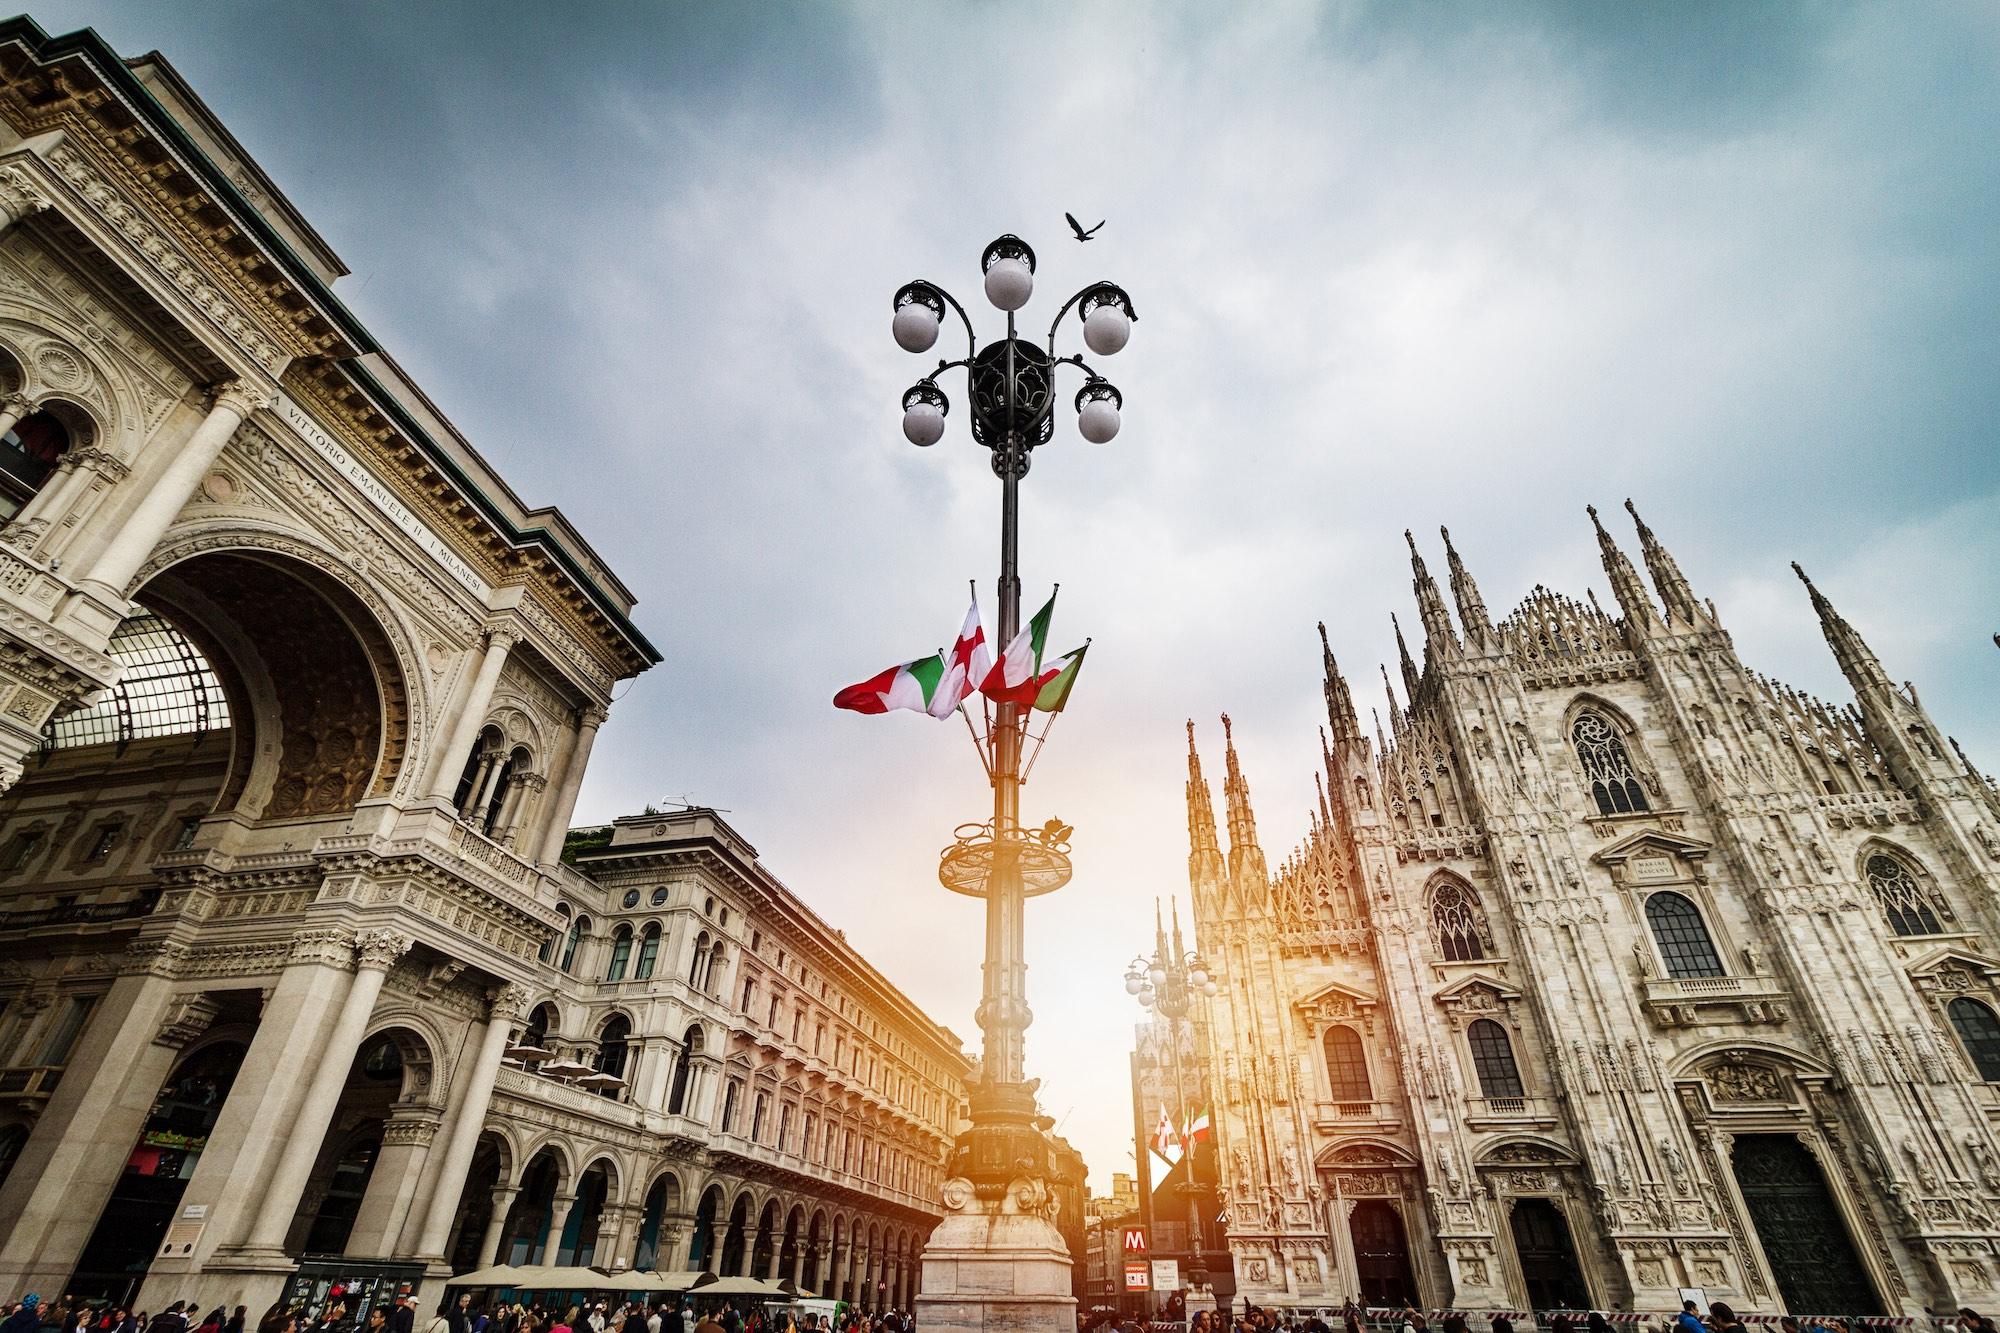 Duomo Italy Milan